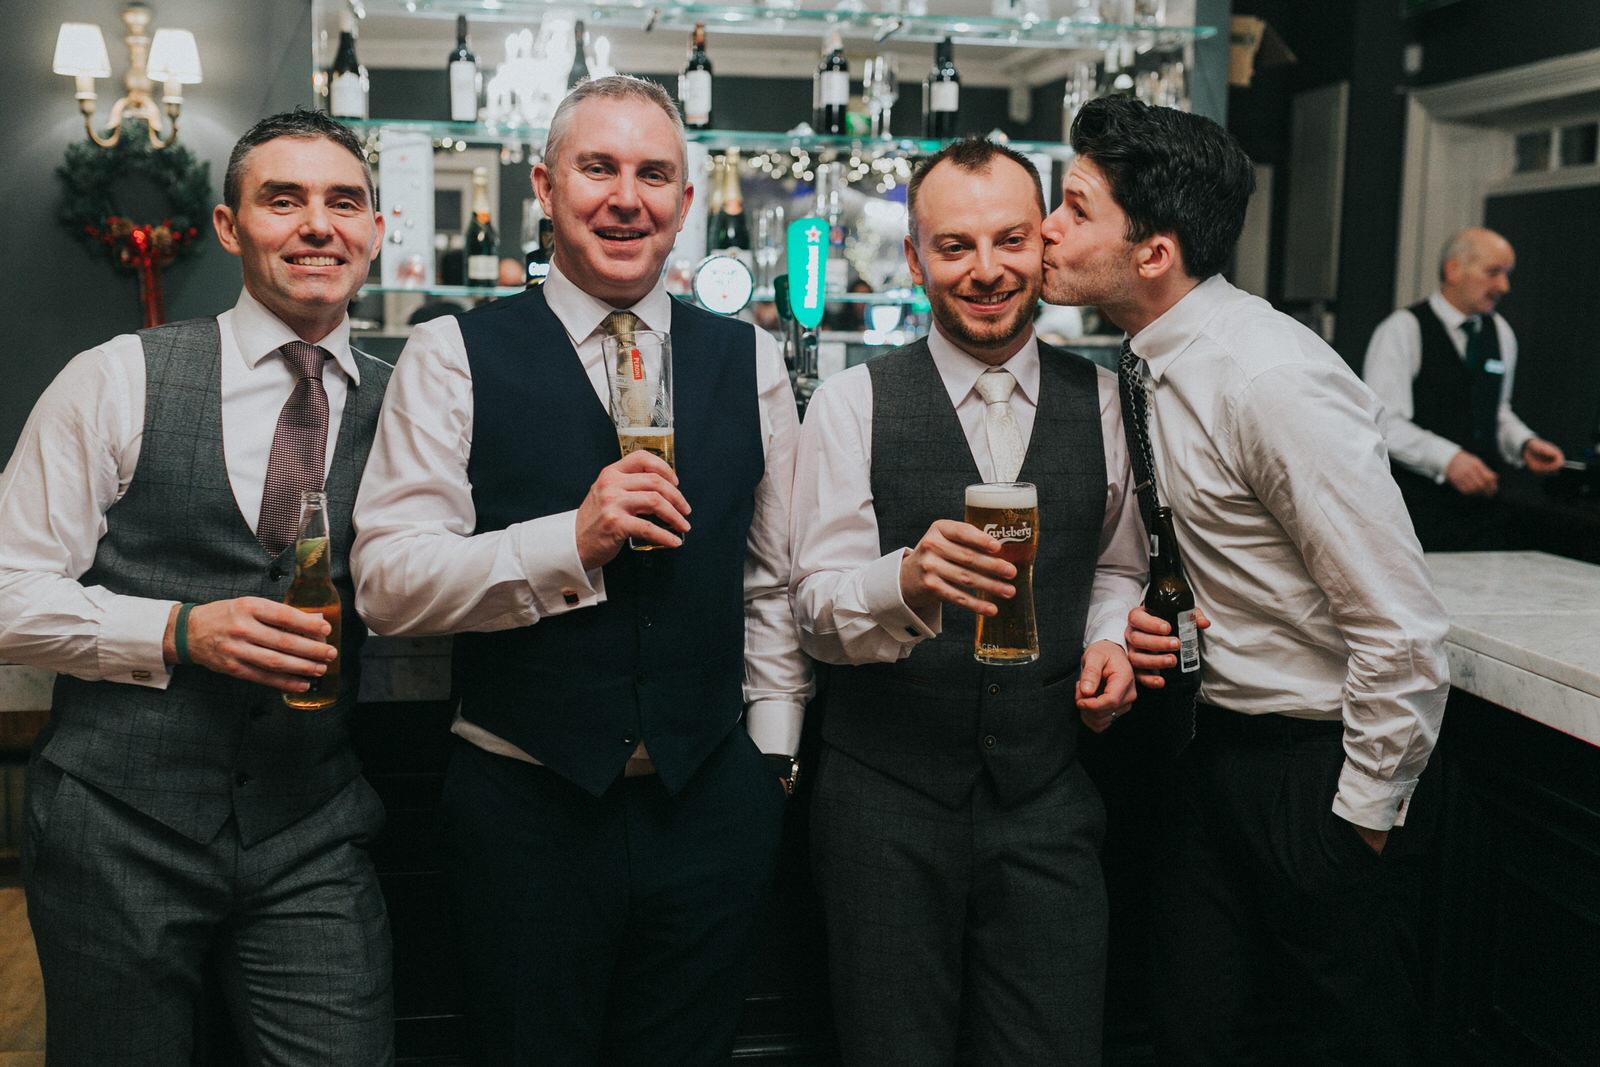 Clonabreany_wedding-photographer_roger_kenny_ireland_117.jpg